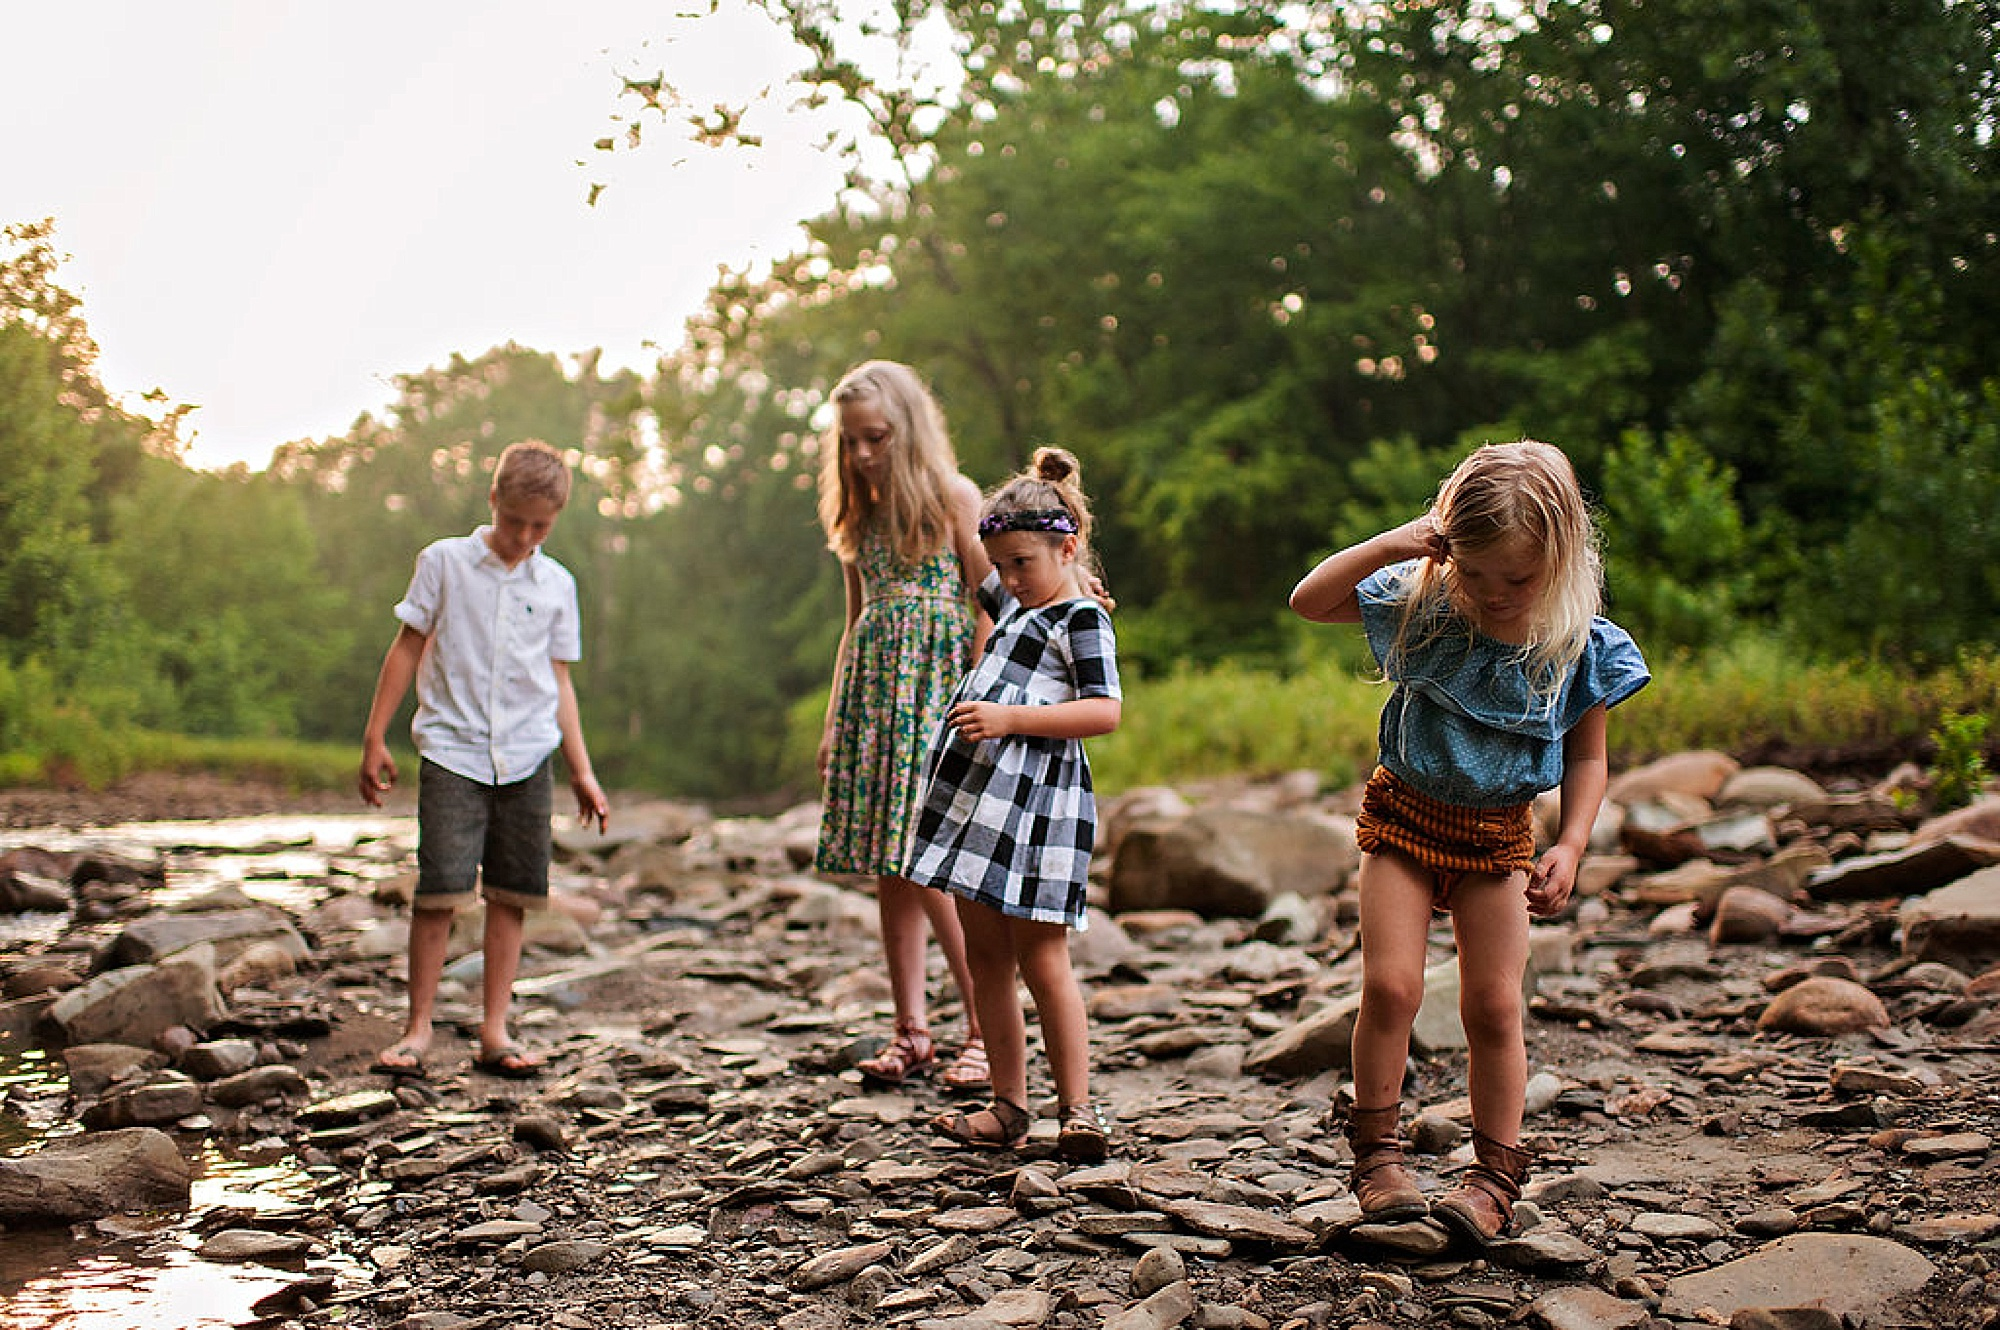 bandy-family-lauren-grayson-akron-ohio_0023.jpg